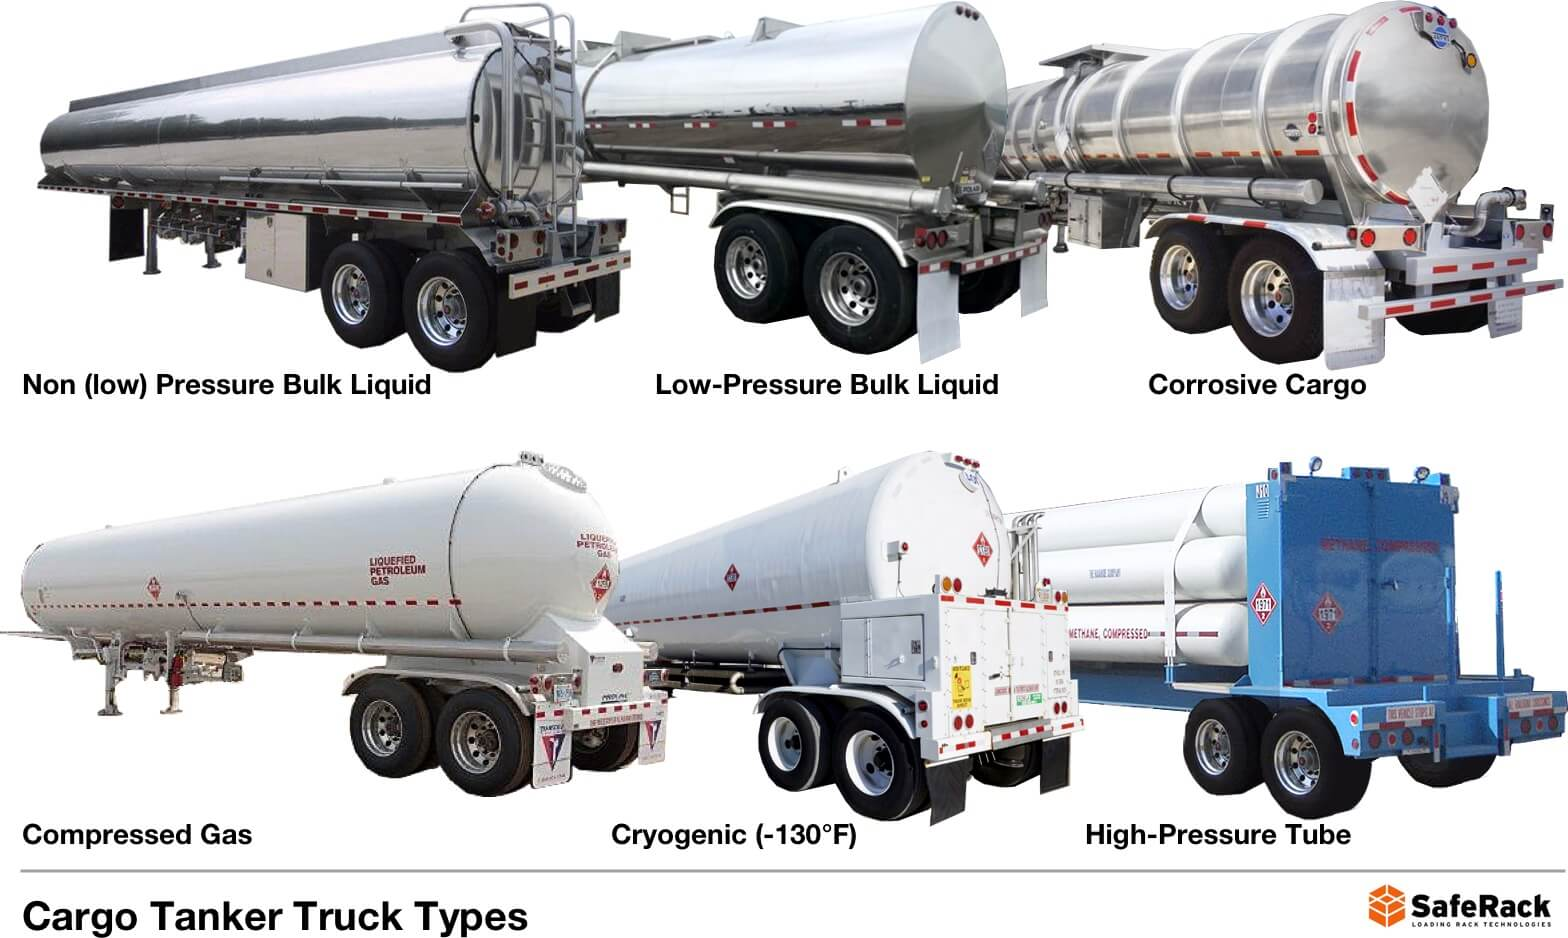 Cargo Truck Tank Types